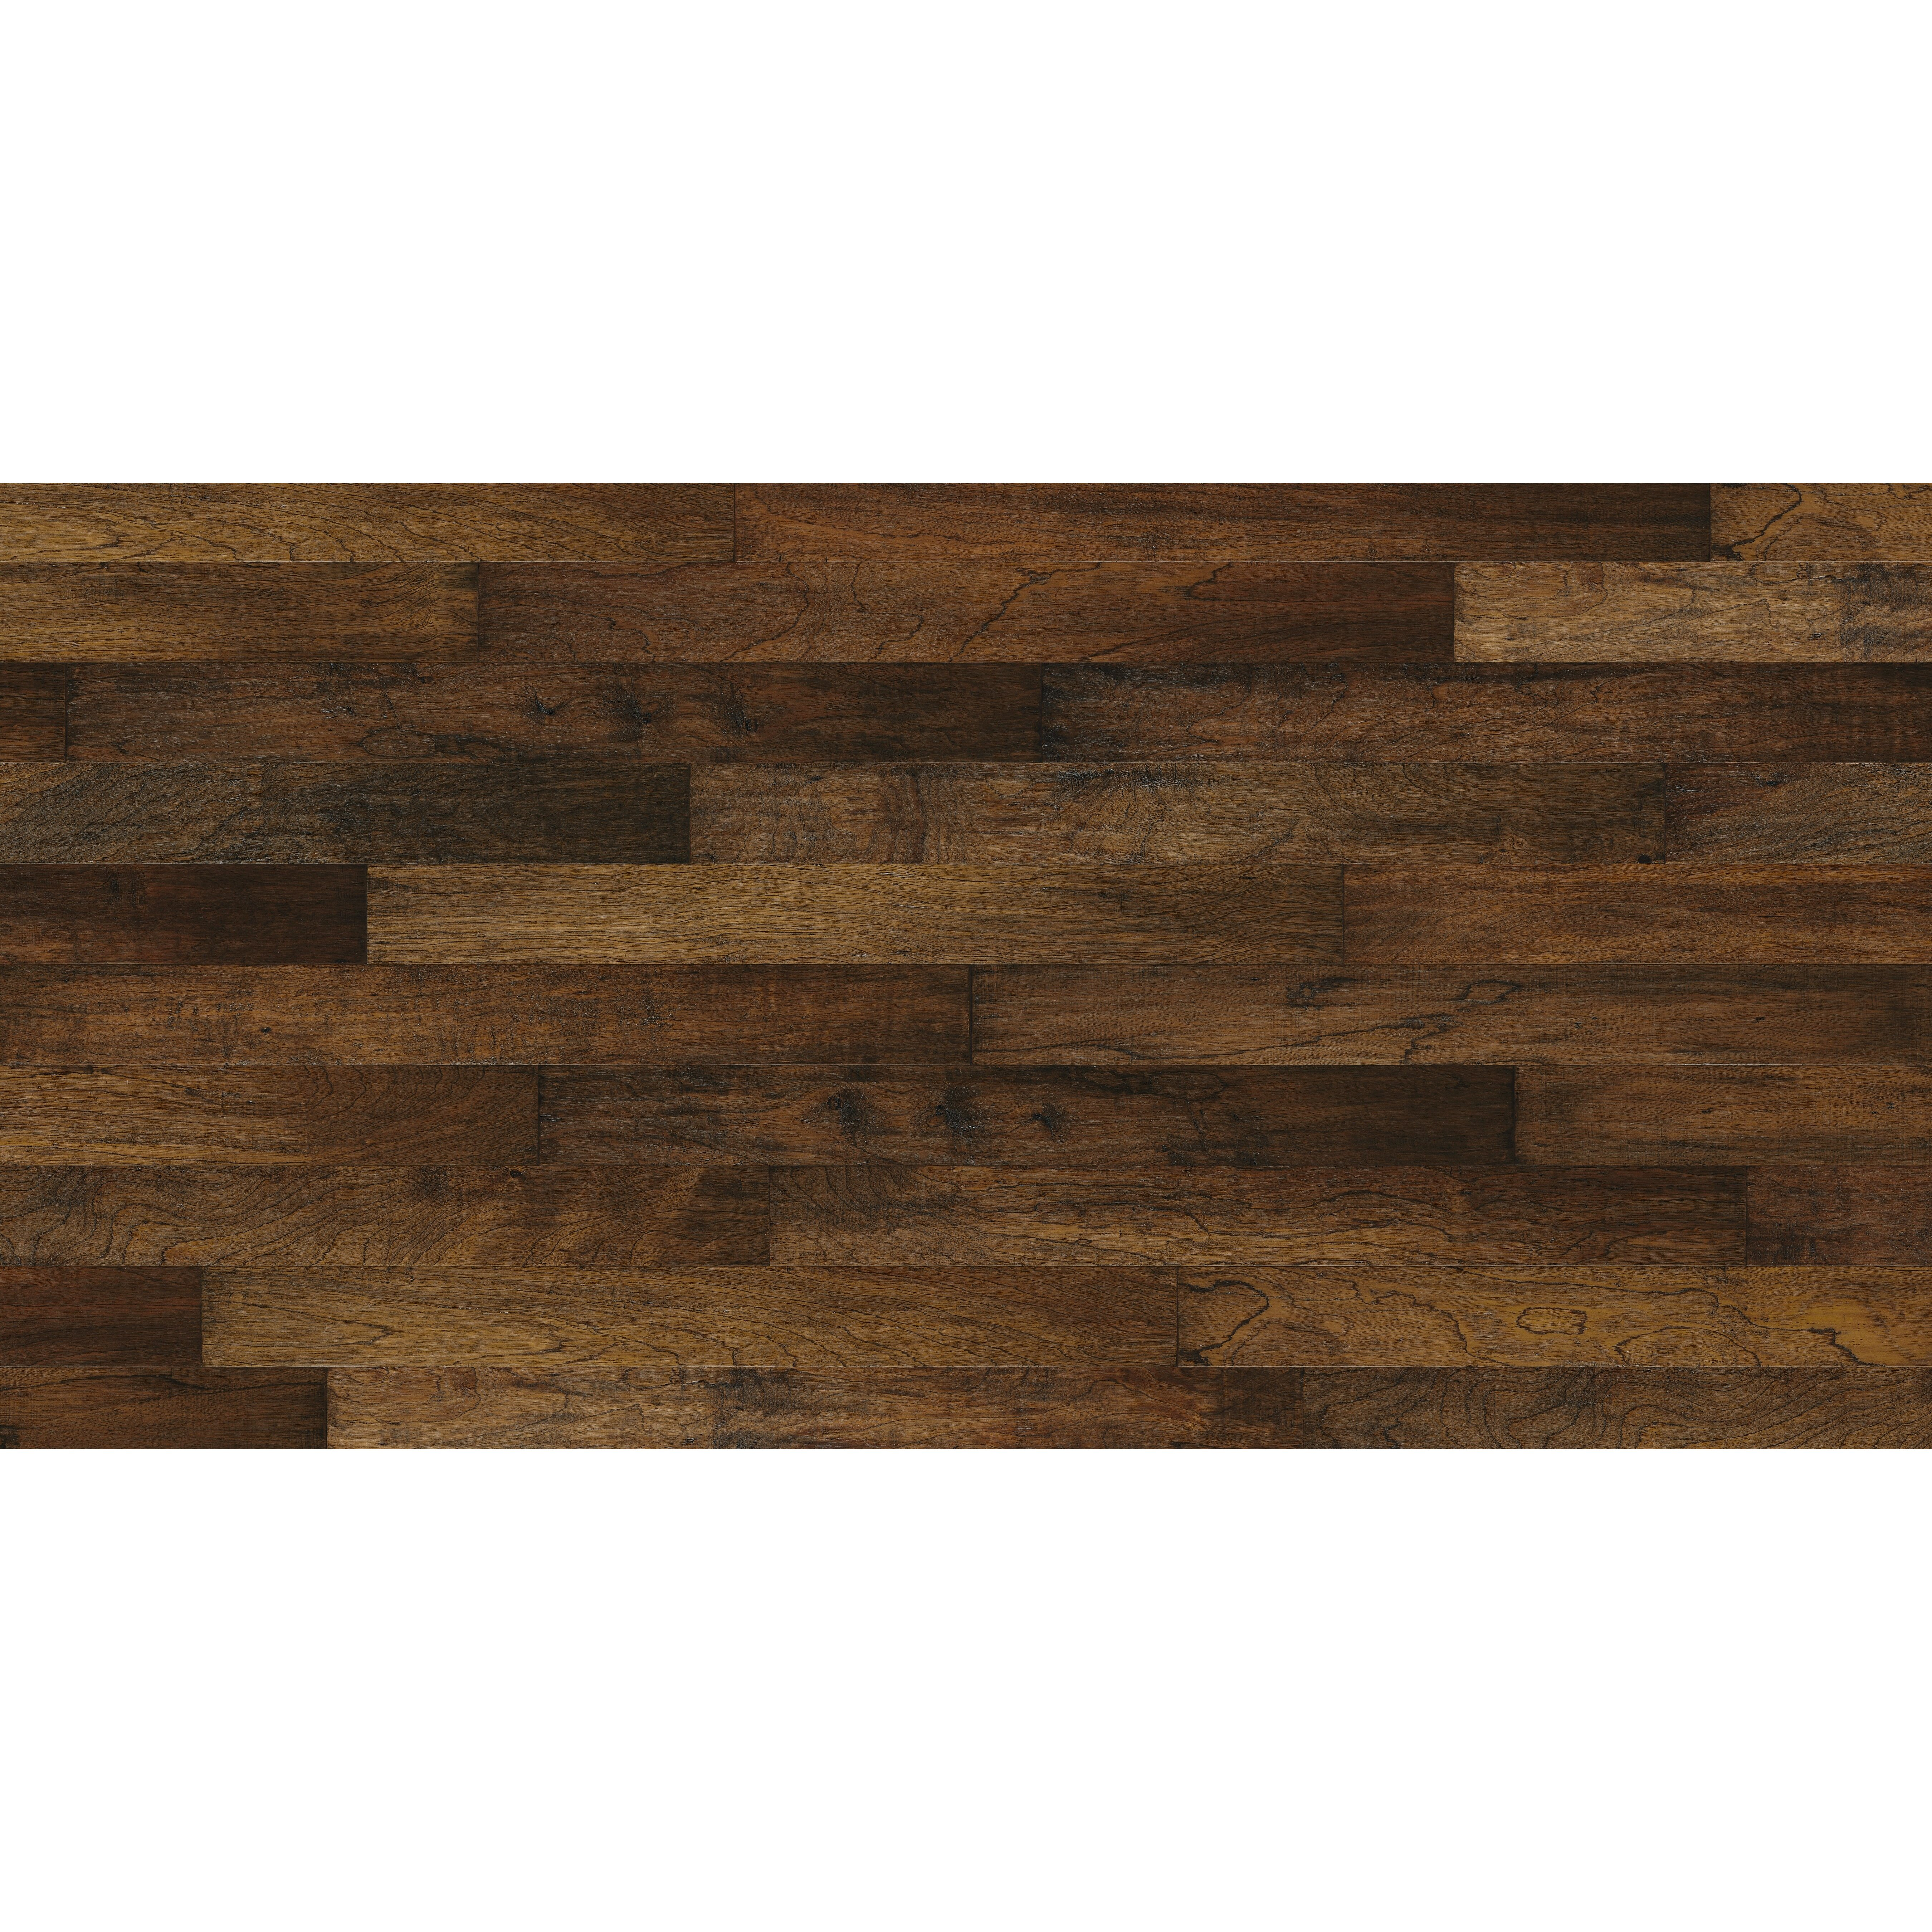 Mannington Mayan Pecan Hardwood Flooring: Mannington Hardwood Flooring